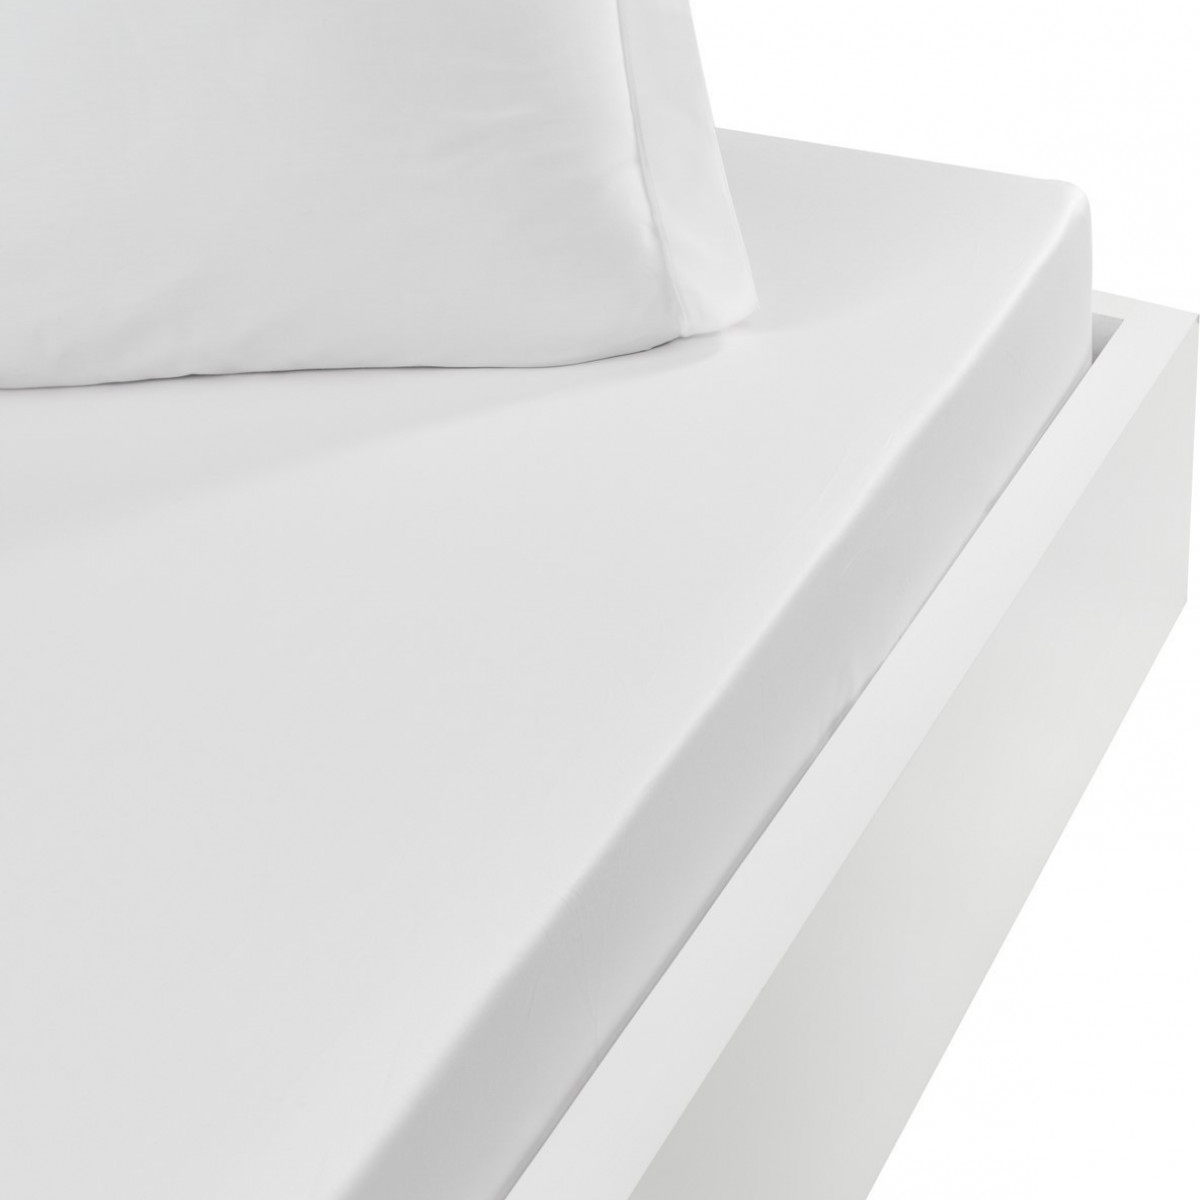 Drap housse en percale de coton bon Blanc 160x200 cm